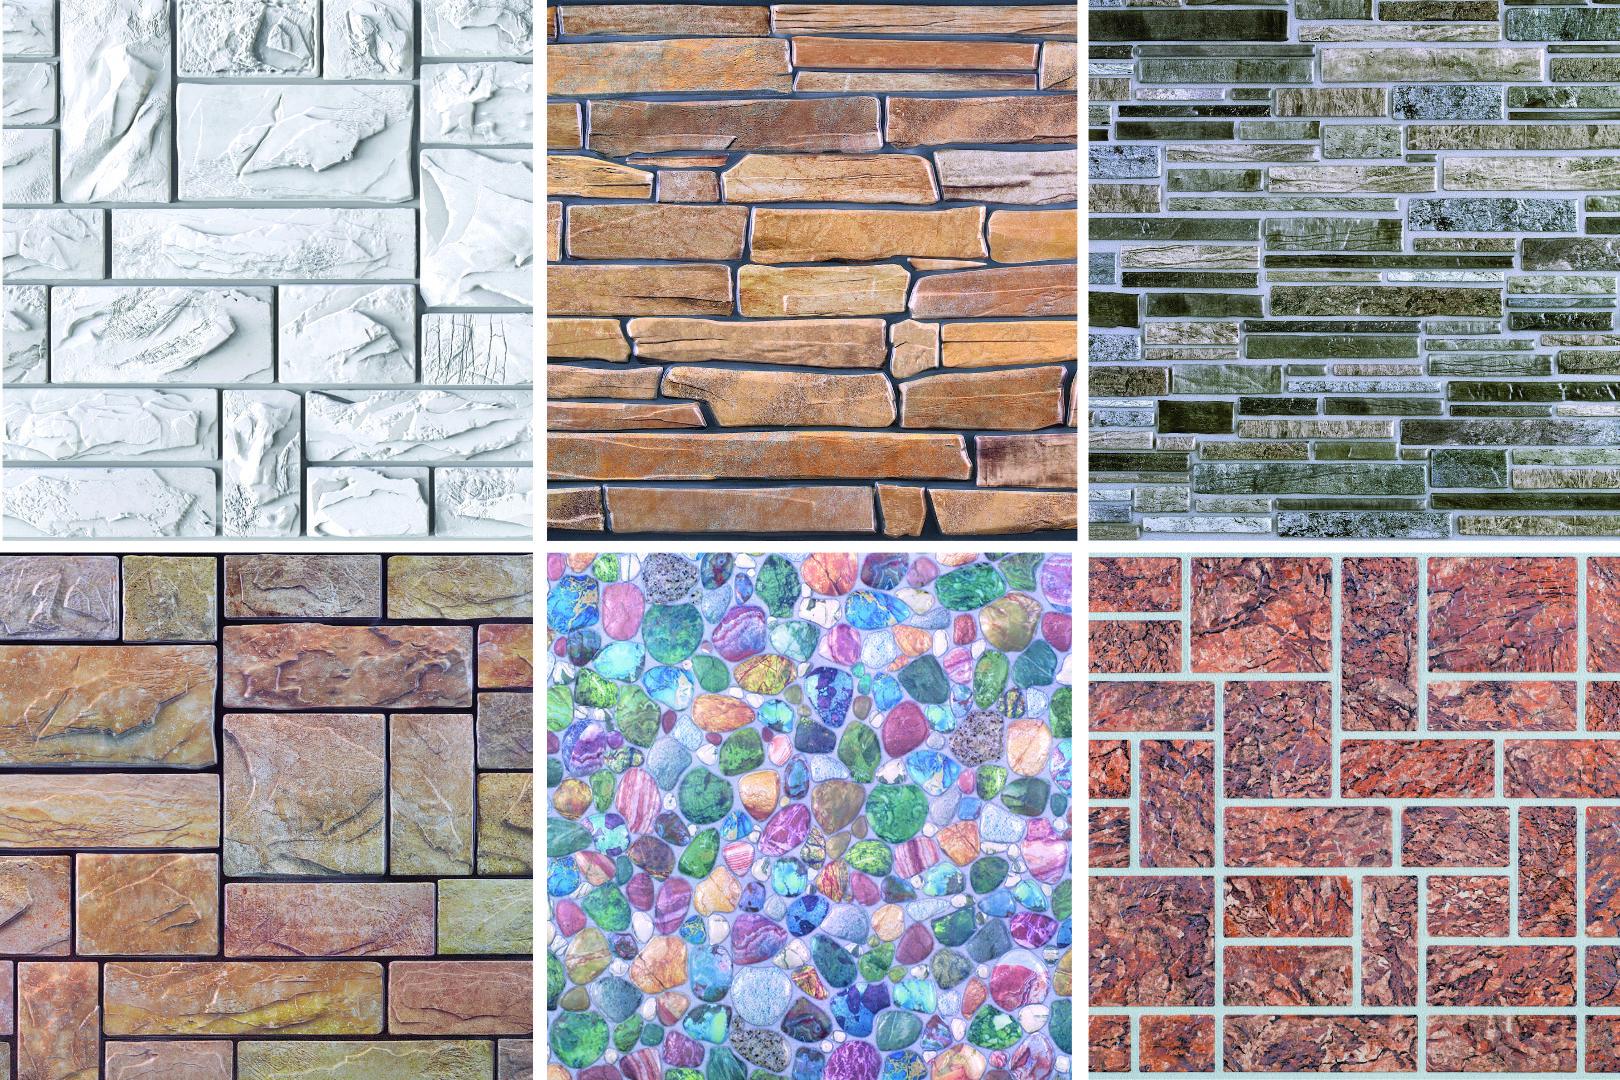 Dekor Paneele   Stein   Auswahl   Wand   Platte   PVC   stabil   95x50cm   Regul